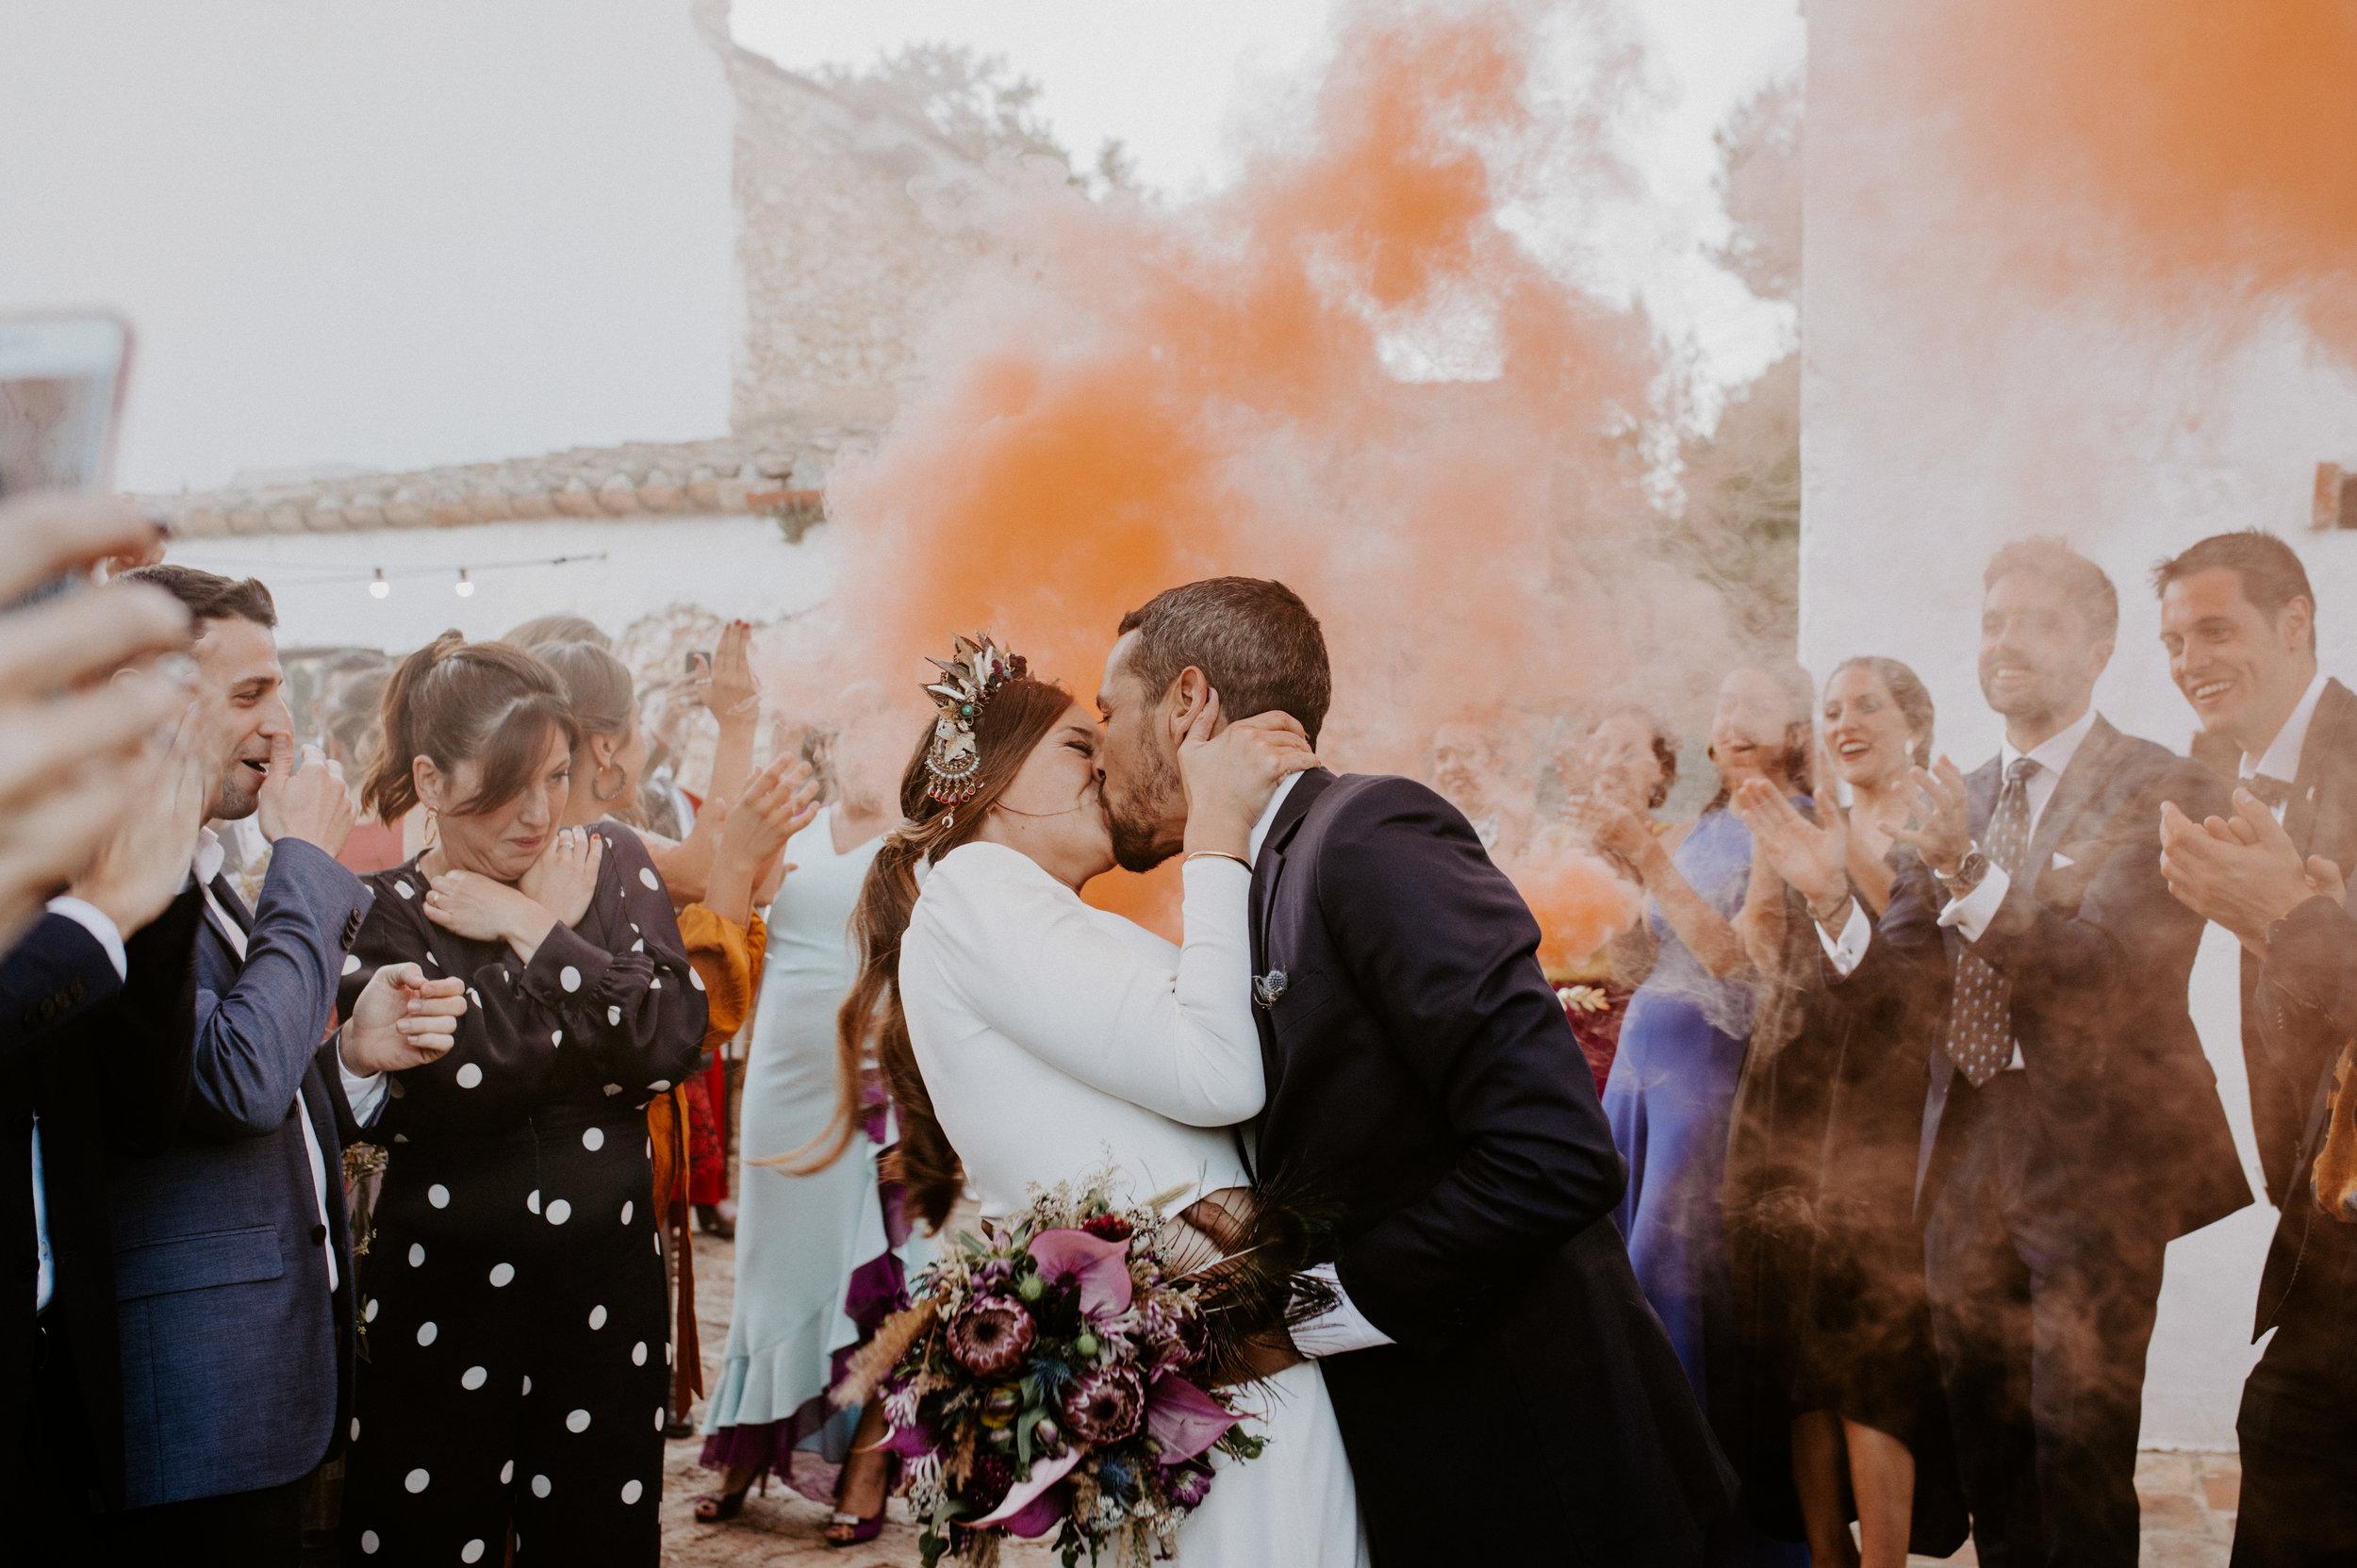 thenortherngirlphotography-fotografa-de-bodas-barcelona_destinartion-wedding-photographer_wedding-photographer_moroccan-wedding_HADNANANTIGONA-1017.jpg